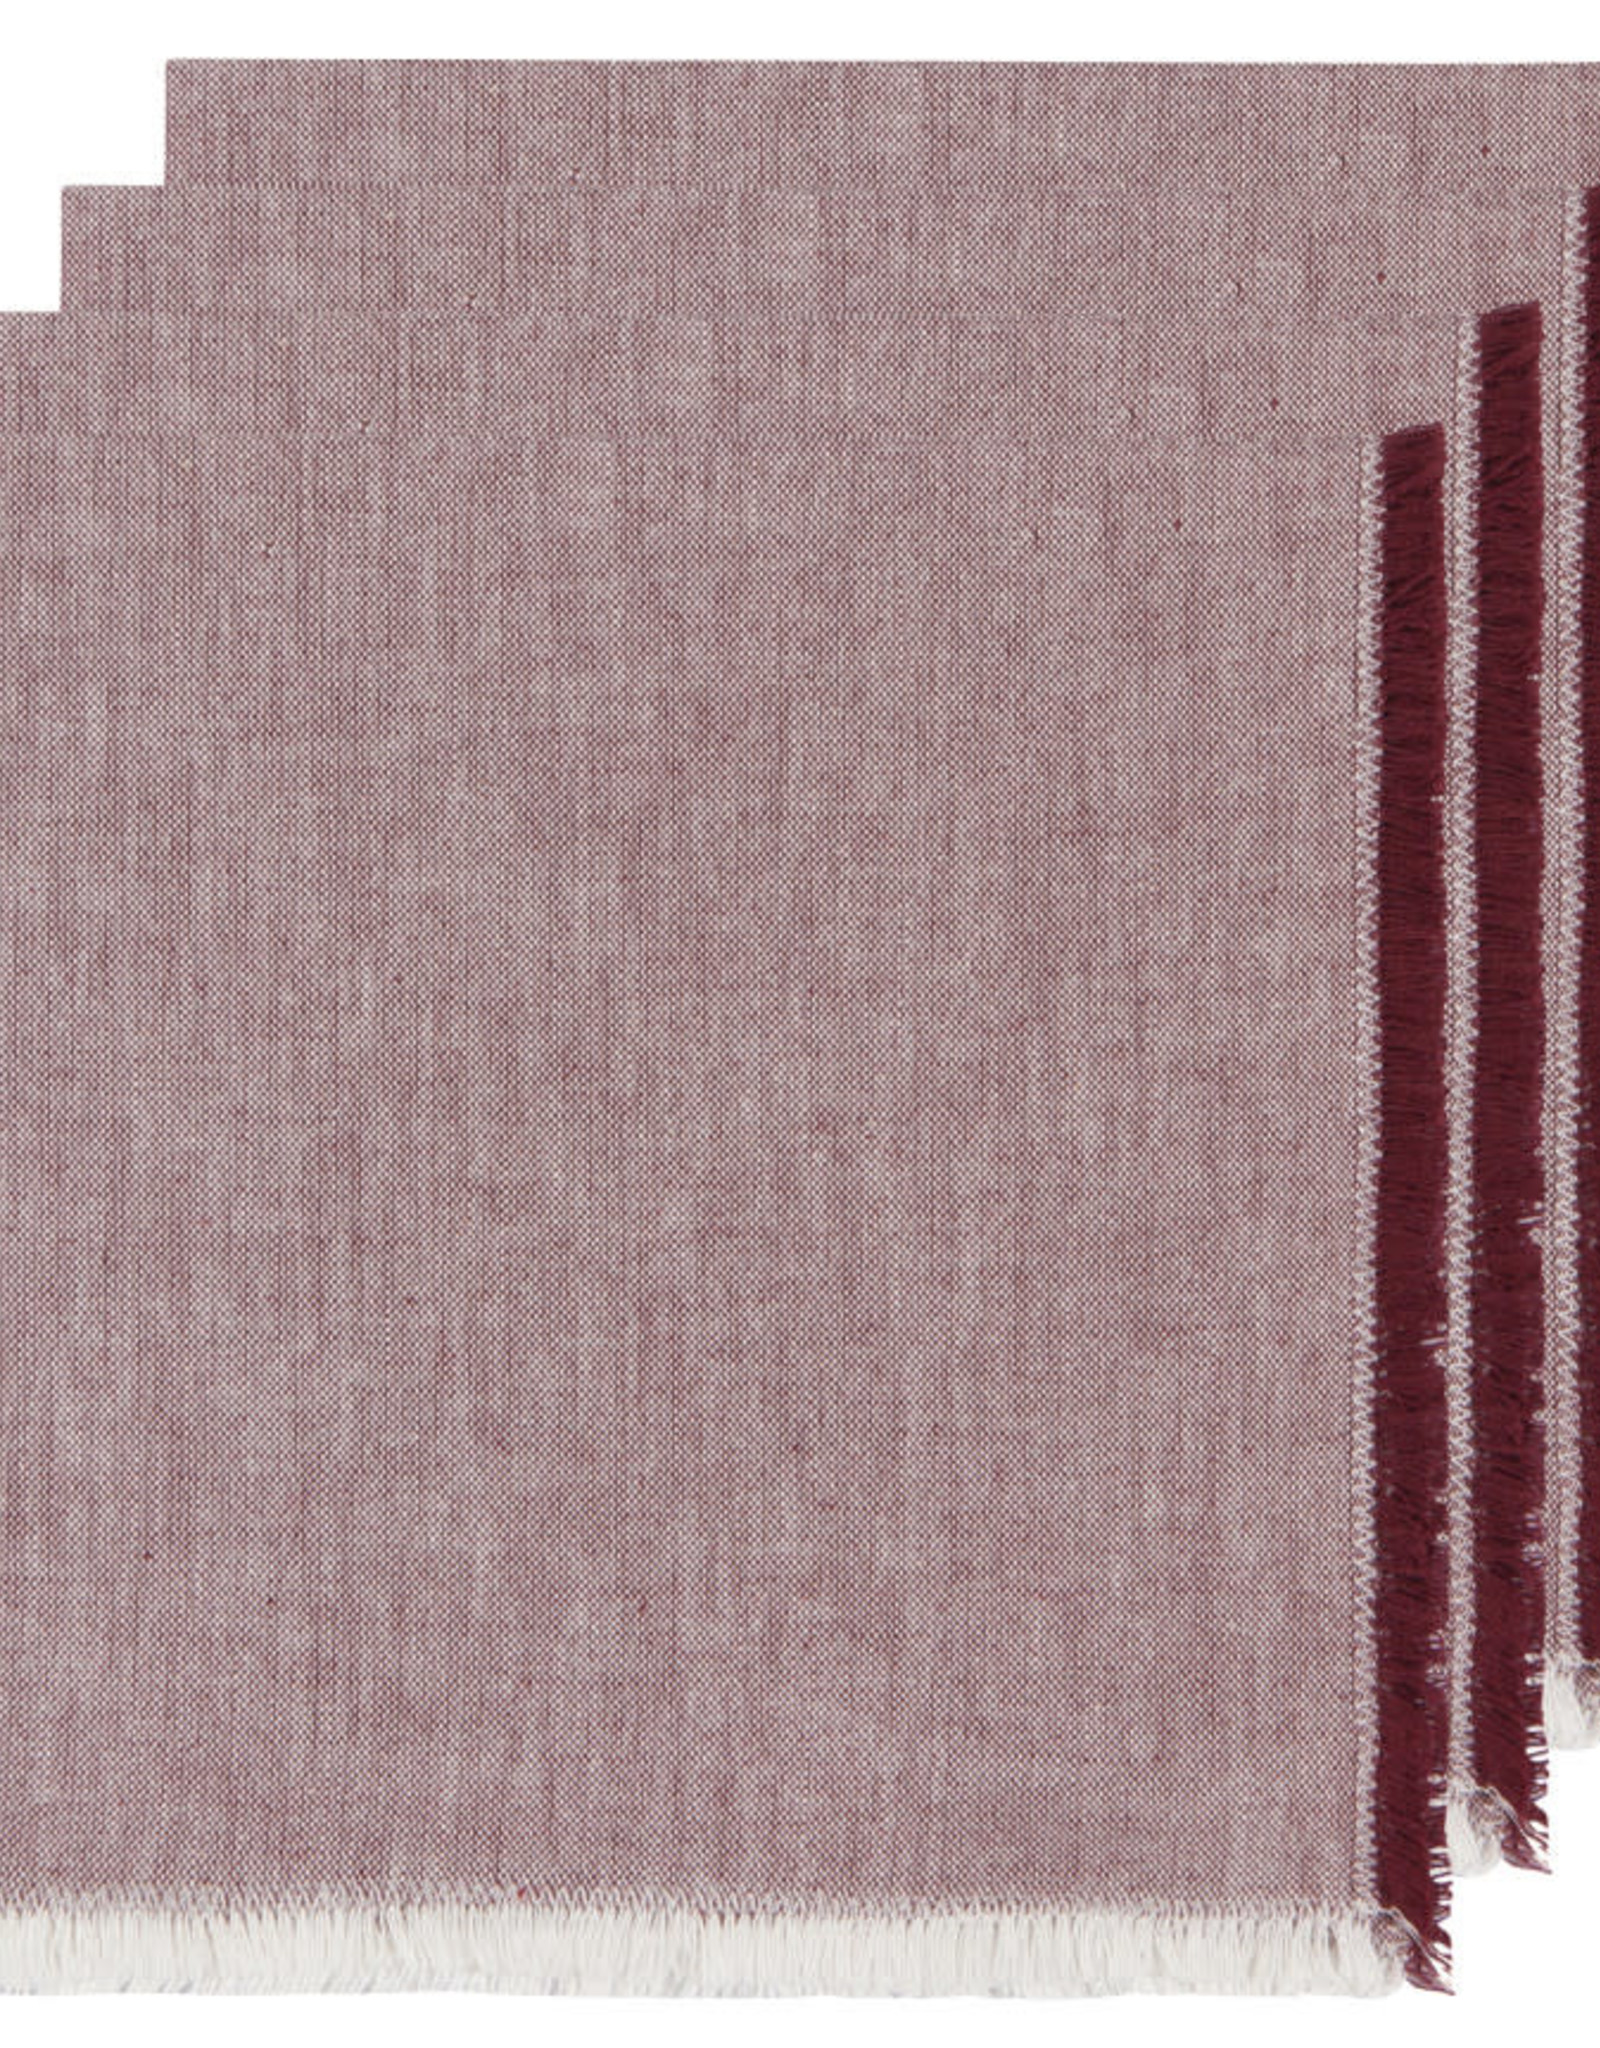 NOW DESIGNS NAPKIN CLOTH 18X18 INCH HEIRLOOM WINE PURPLE RED